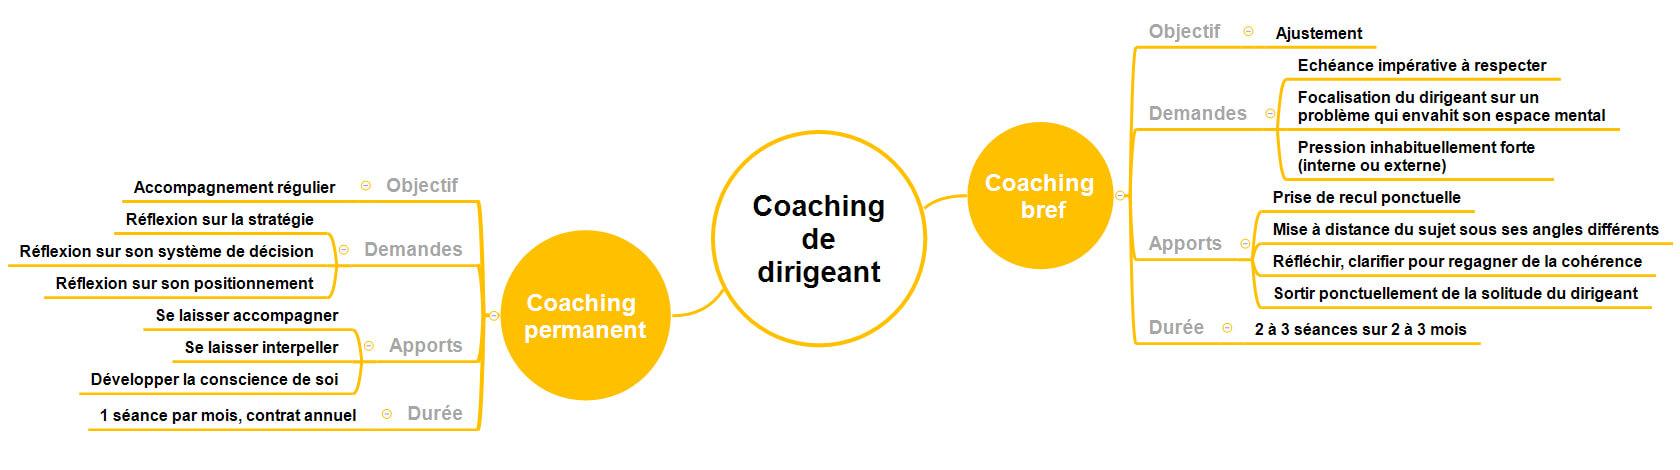 impulsc-coaching-de-dirigeant-bref-et-permanent